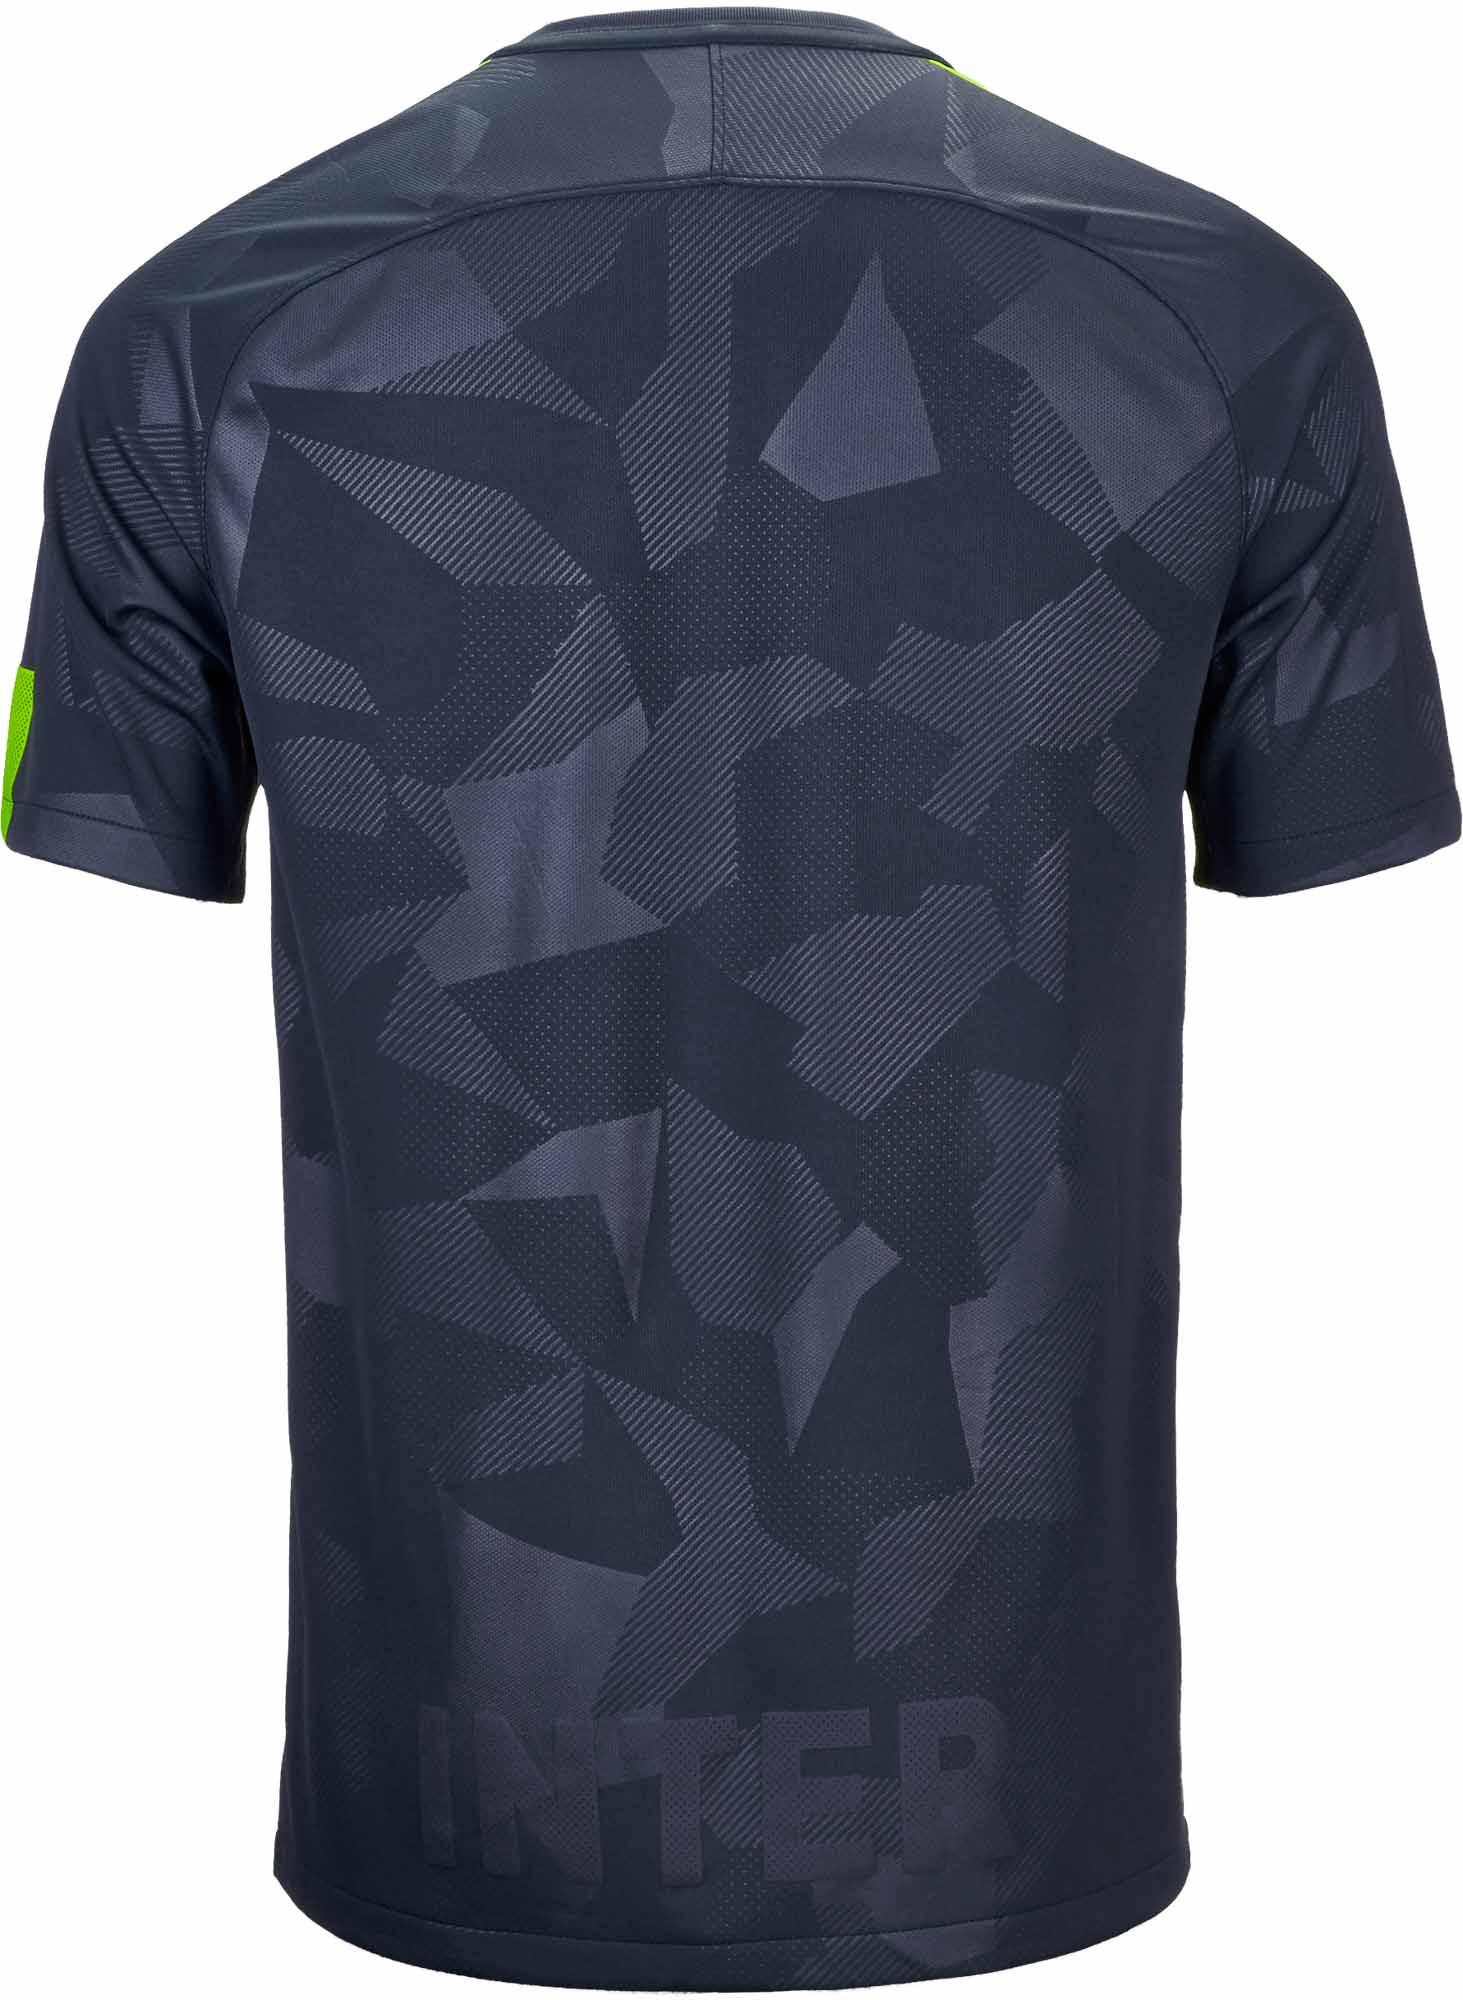 hot sale online ab376 63686 Nike Inter Milan 3rd Jersey 2017-18 - Soccer Master